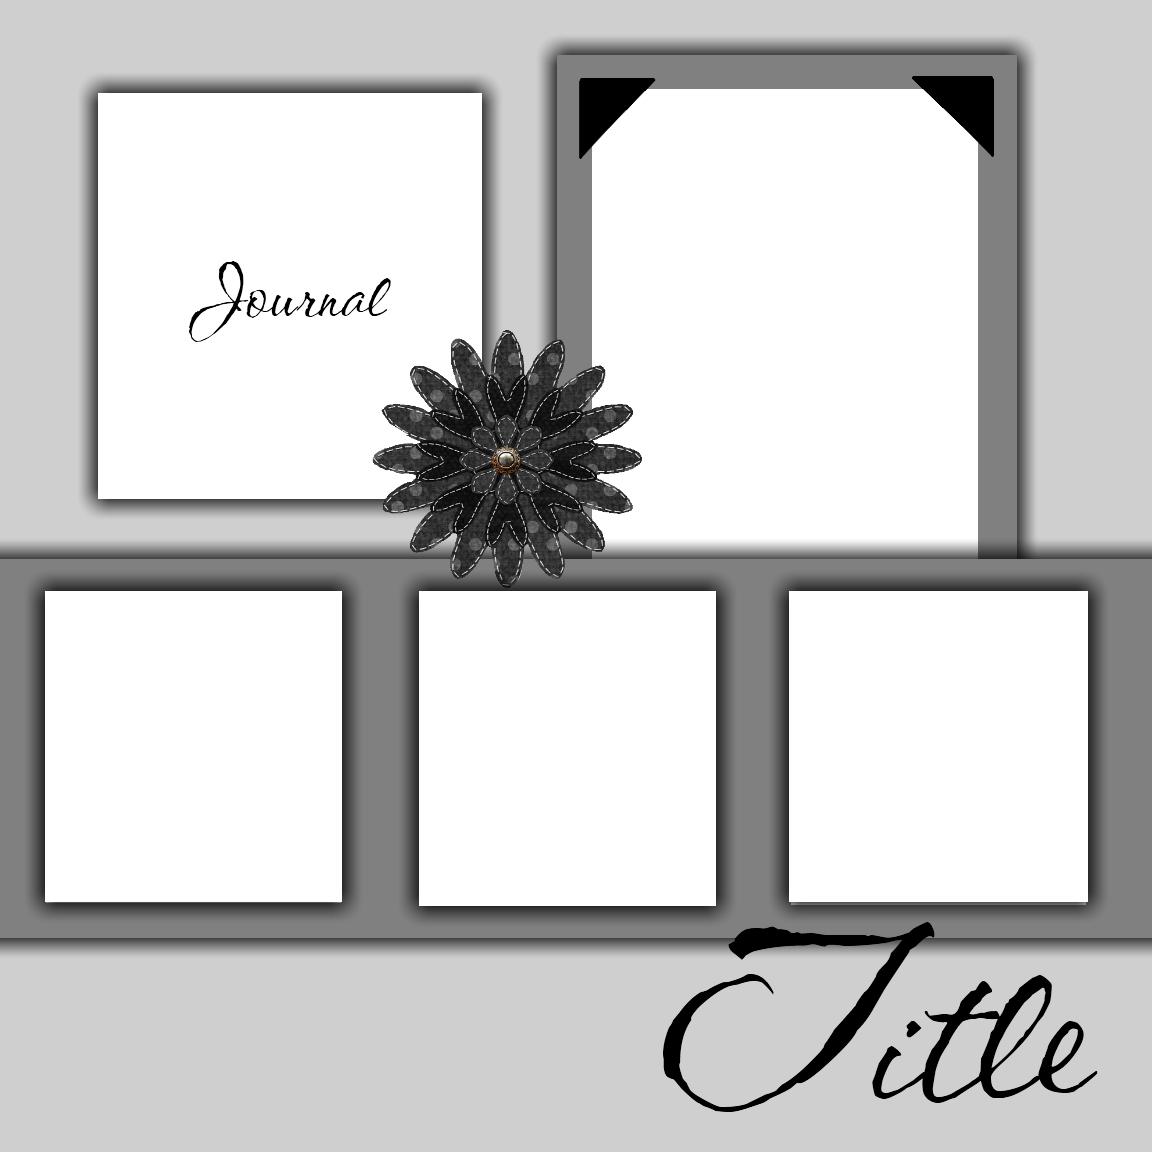 Free Printable Scrapbook Layout Templates | Free Scrapbook Templates - Free Printable Scrapbook Pages Online